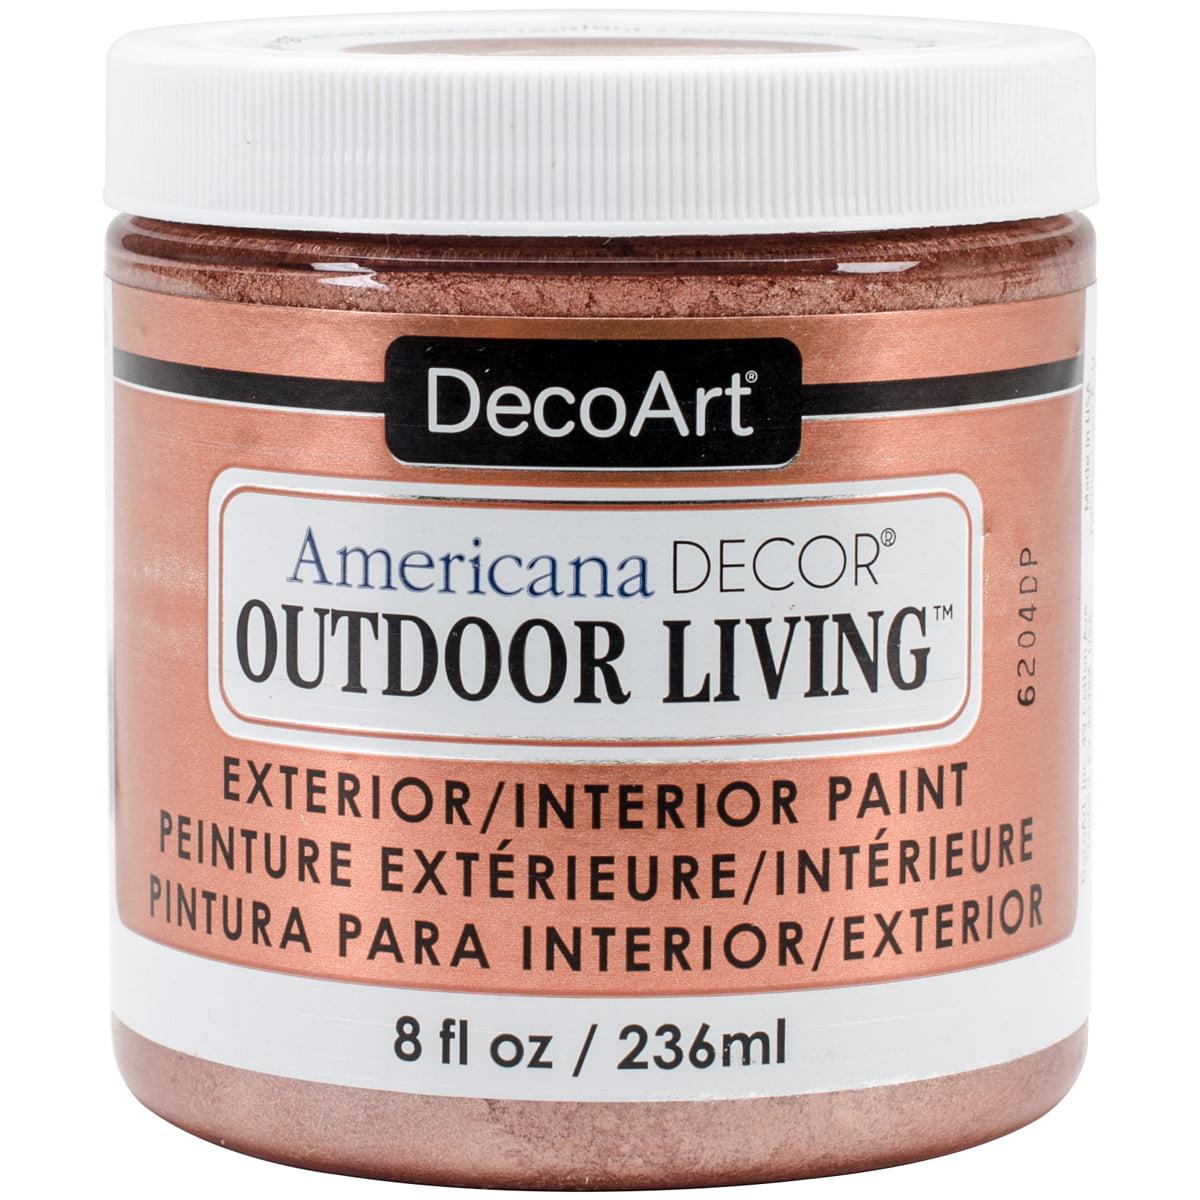 Americana Decor Outdoor Living Metallic Paint 8oz-Rose Gold